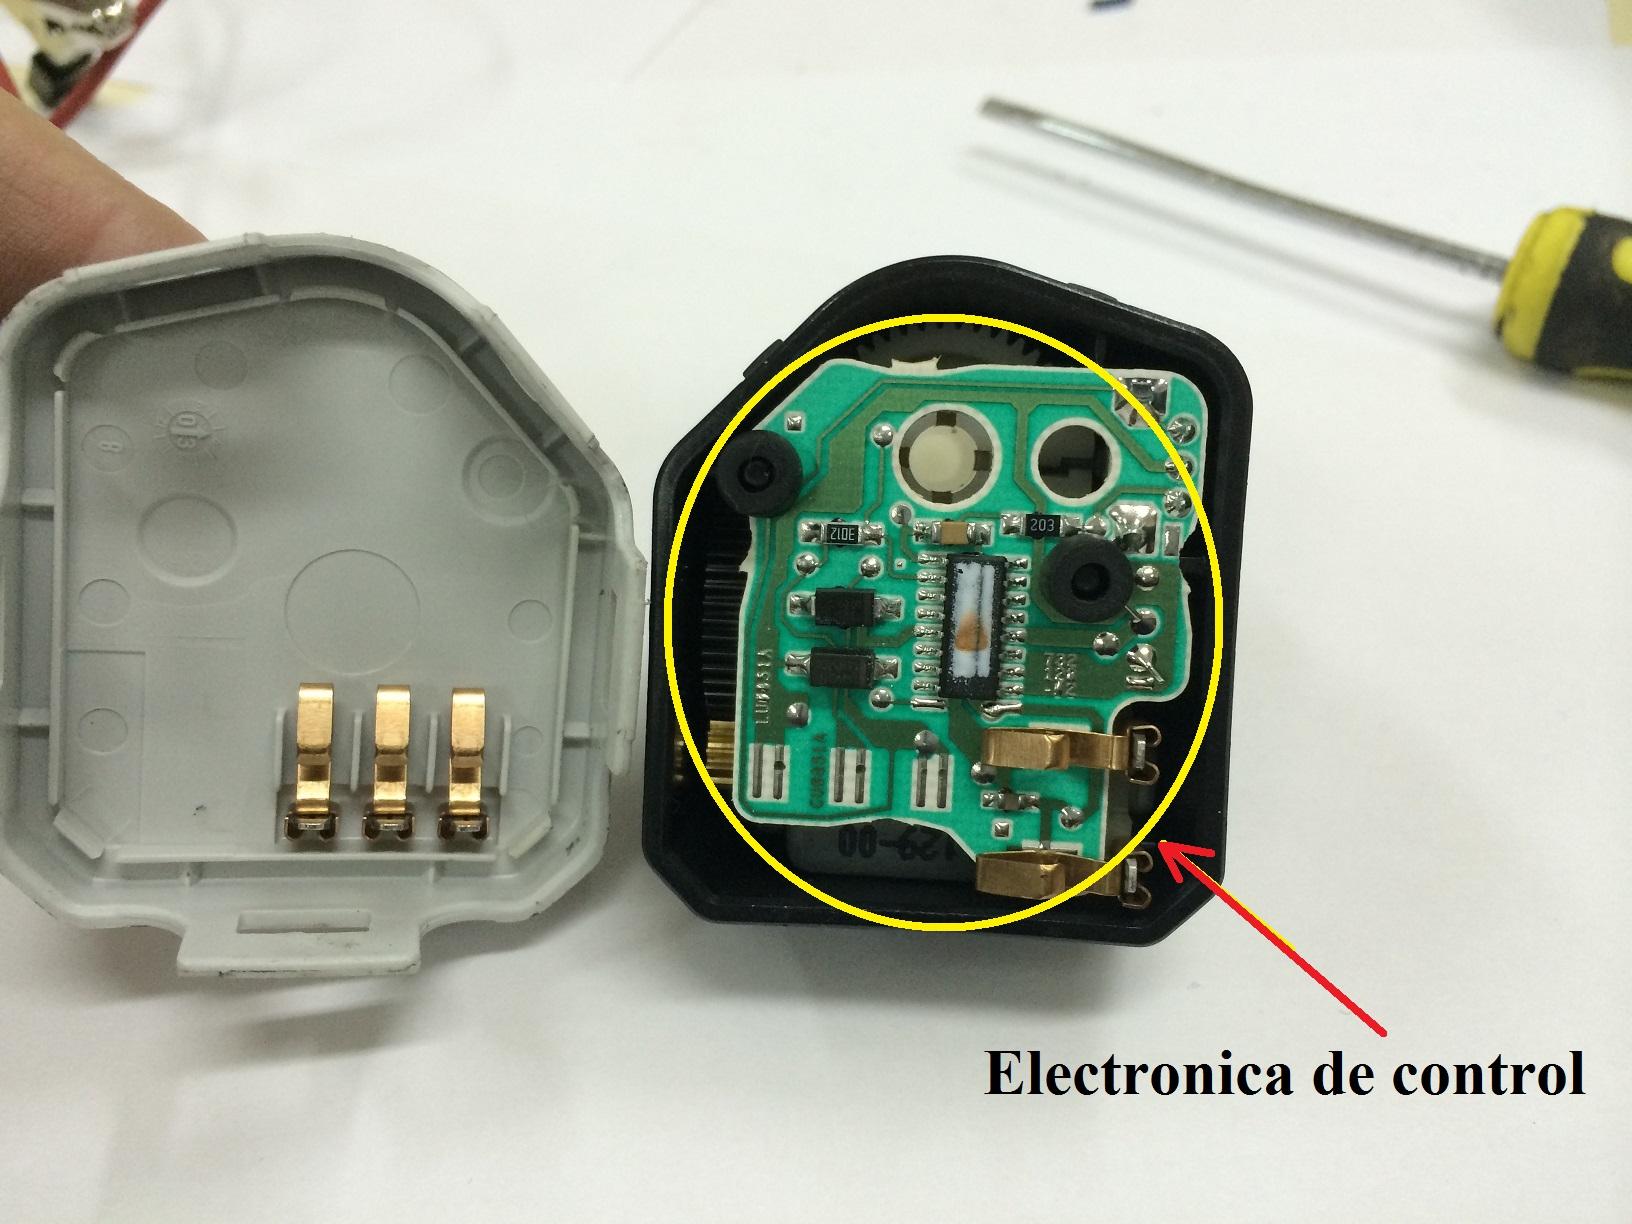 fabricante potenciometro electronica: